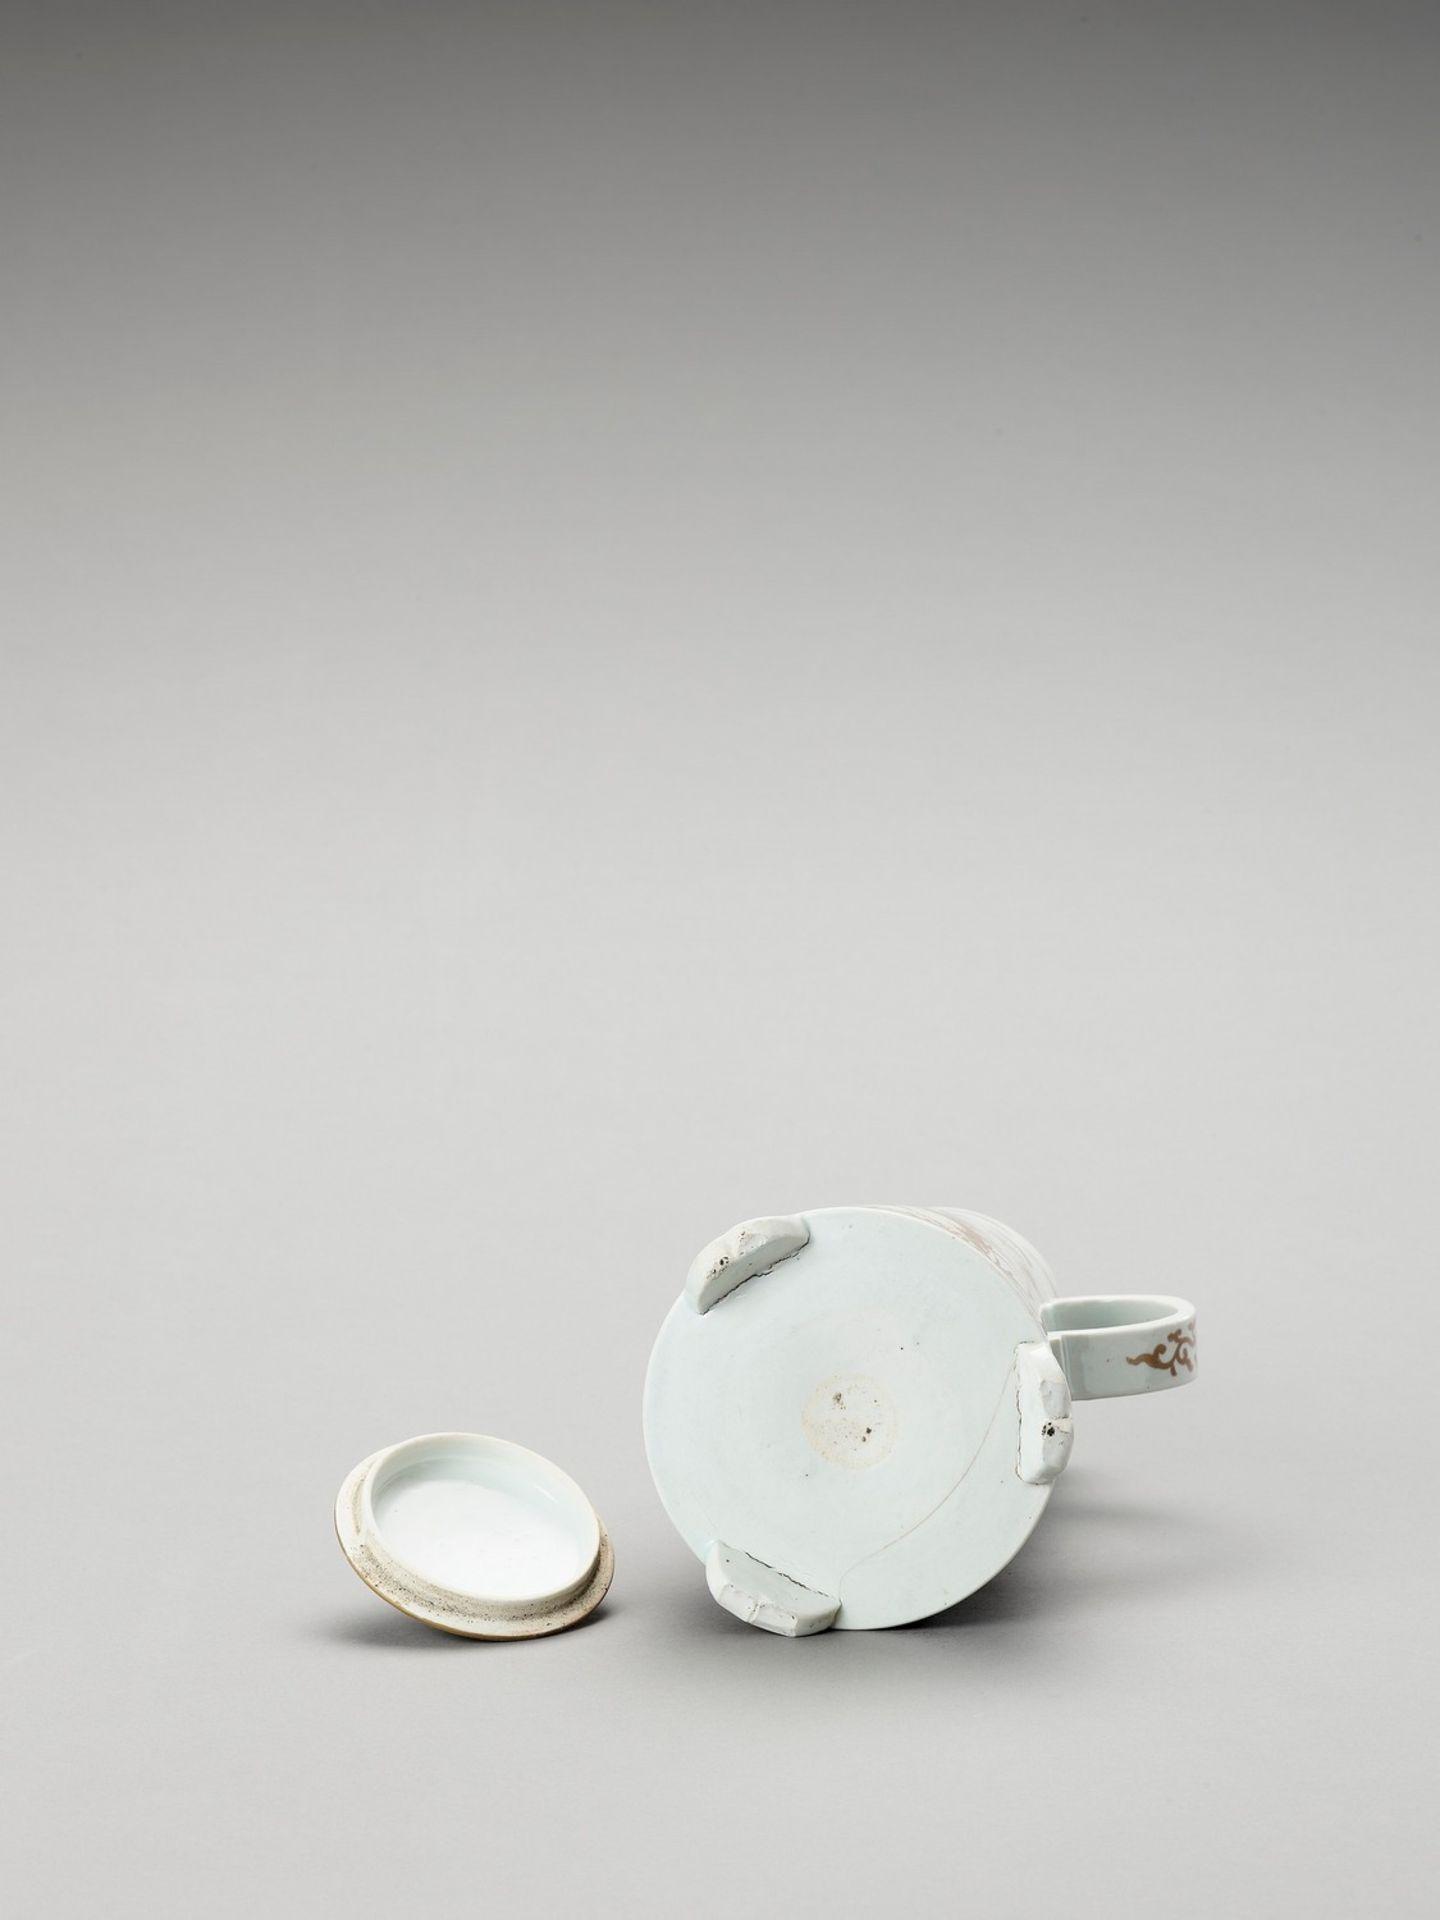 AN IMARI PORCELAIN COFFEE POT AND COVER - Bild 6 aus 6